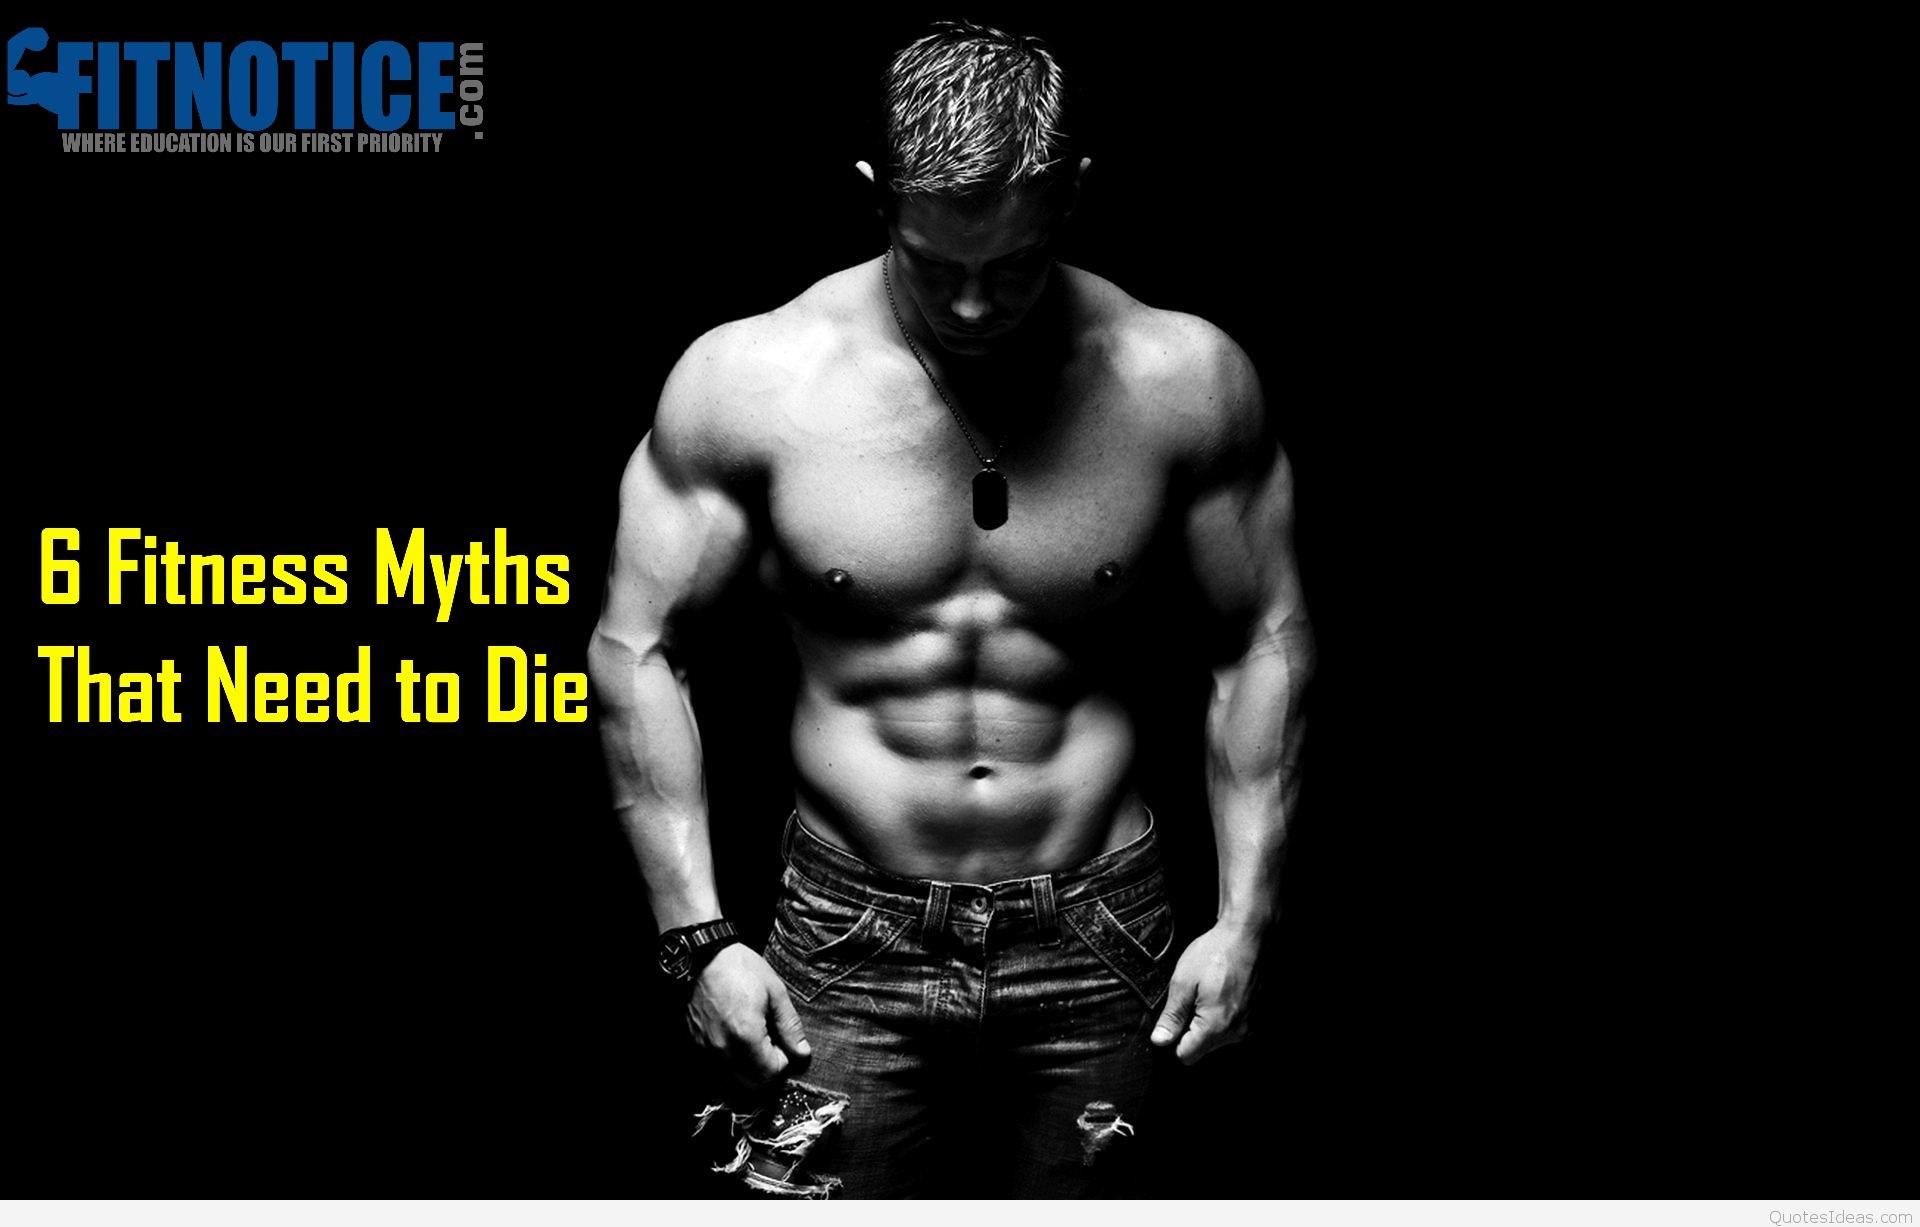 6 Fitness Myths